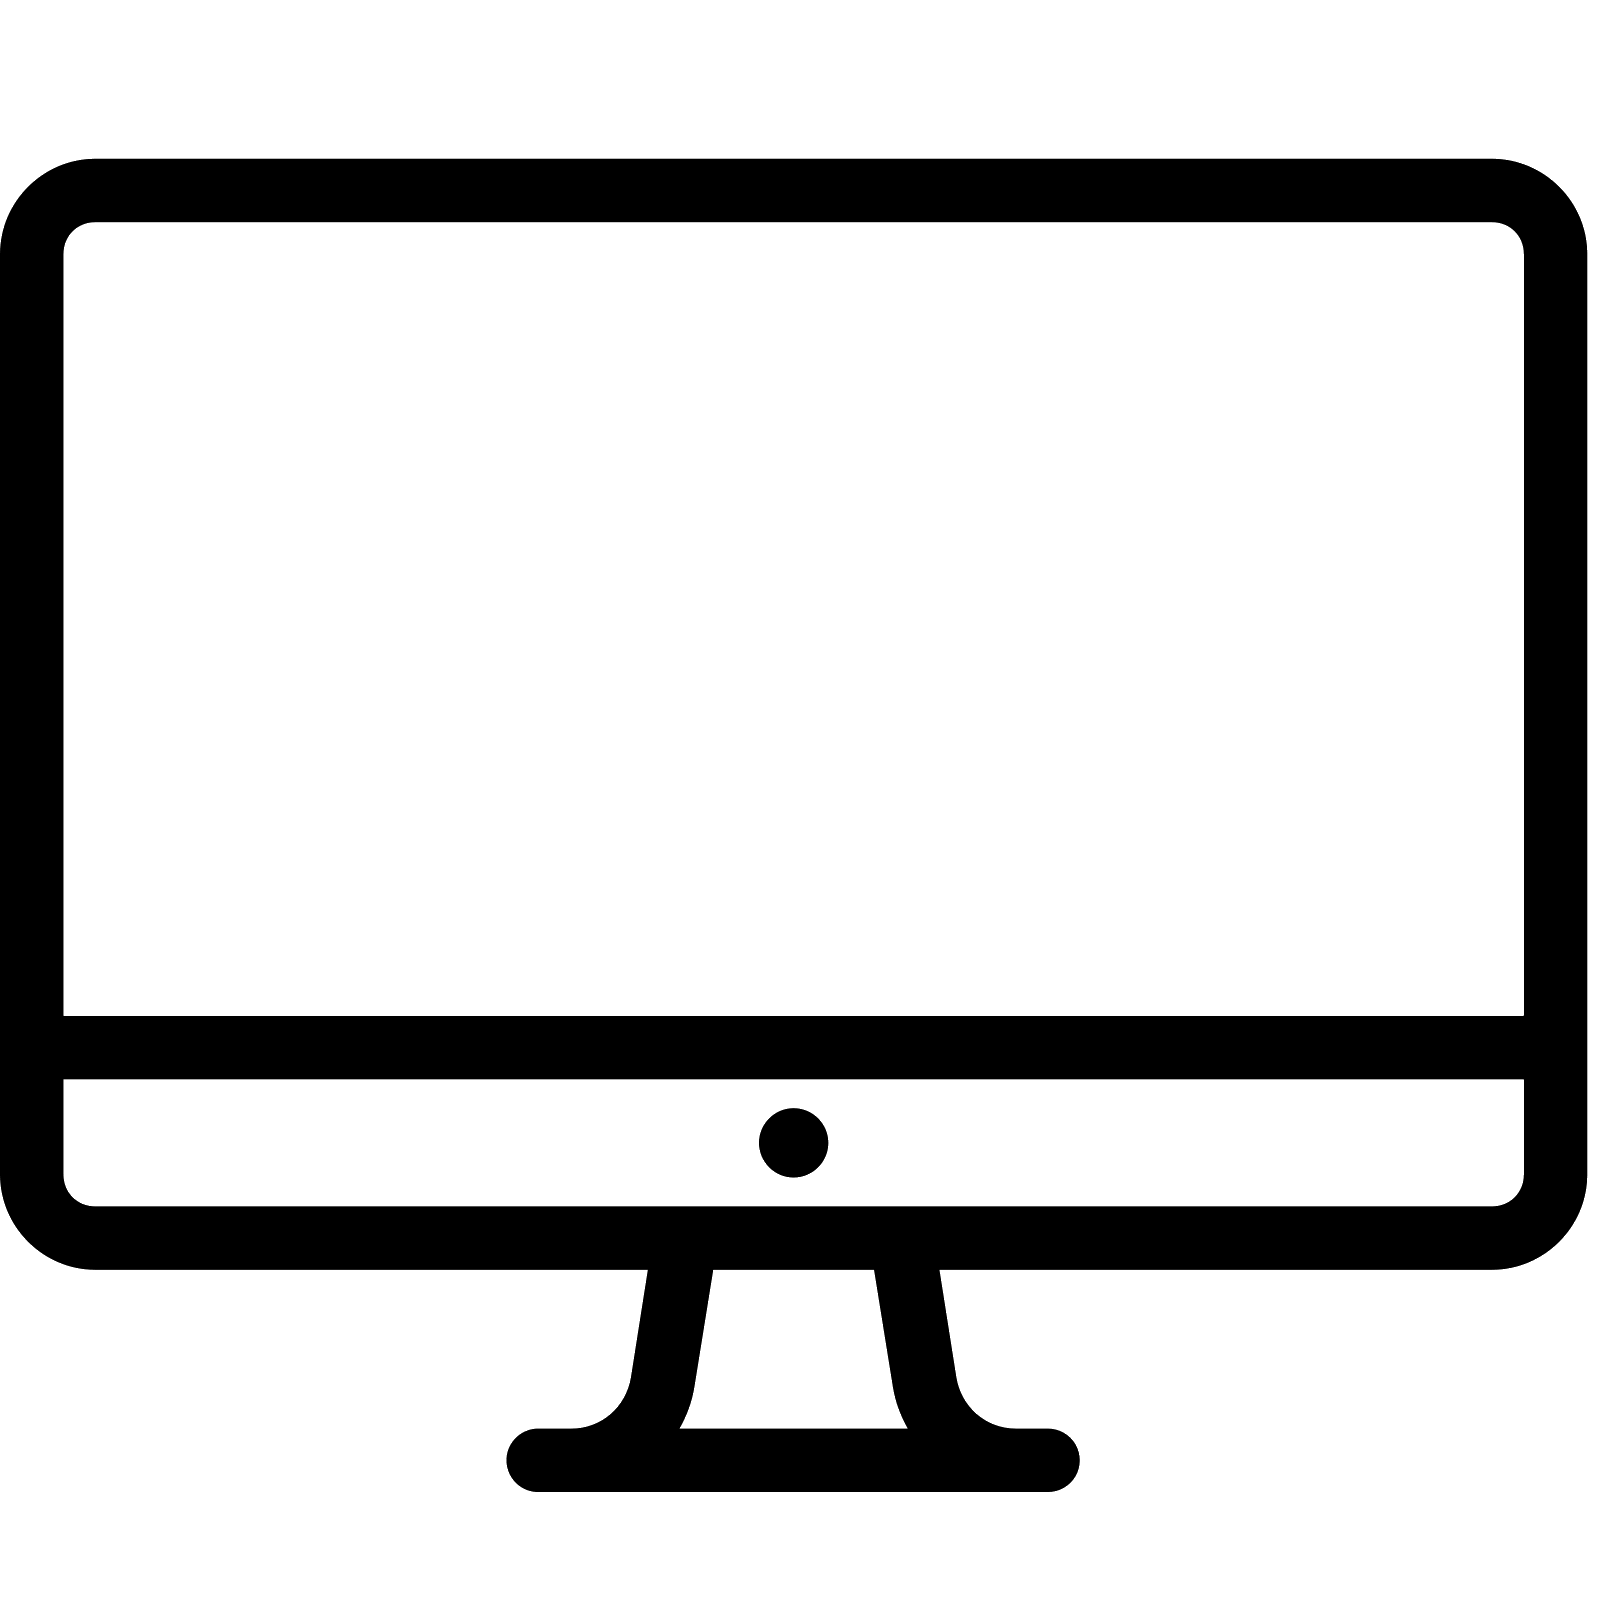 1600x1600 Imac Icon